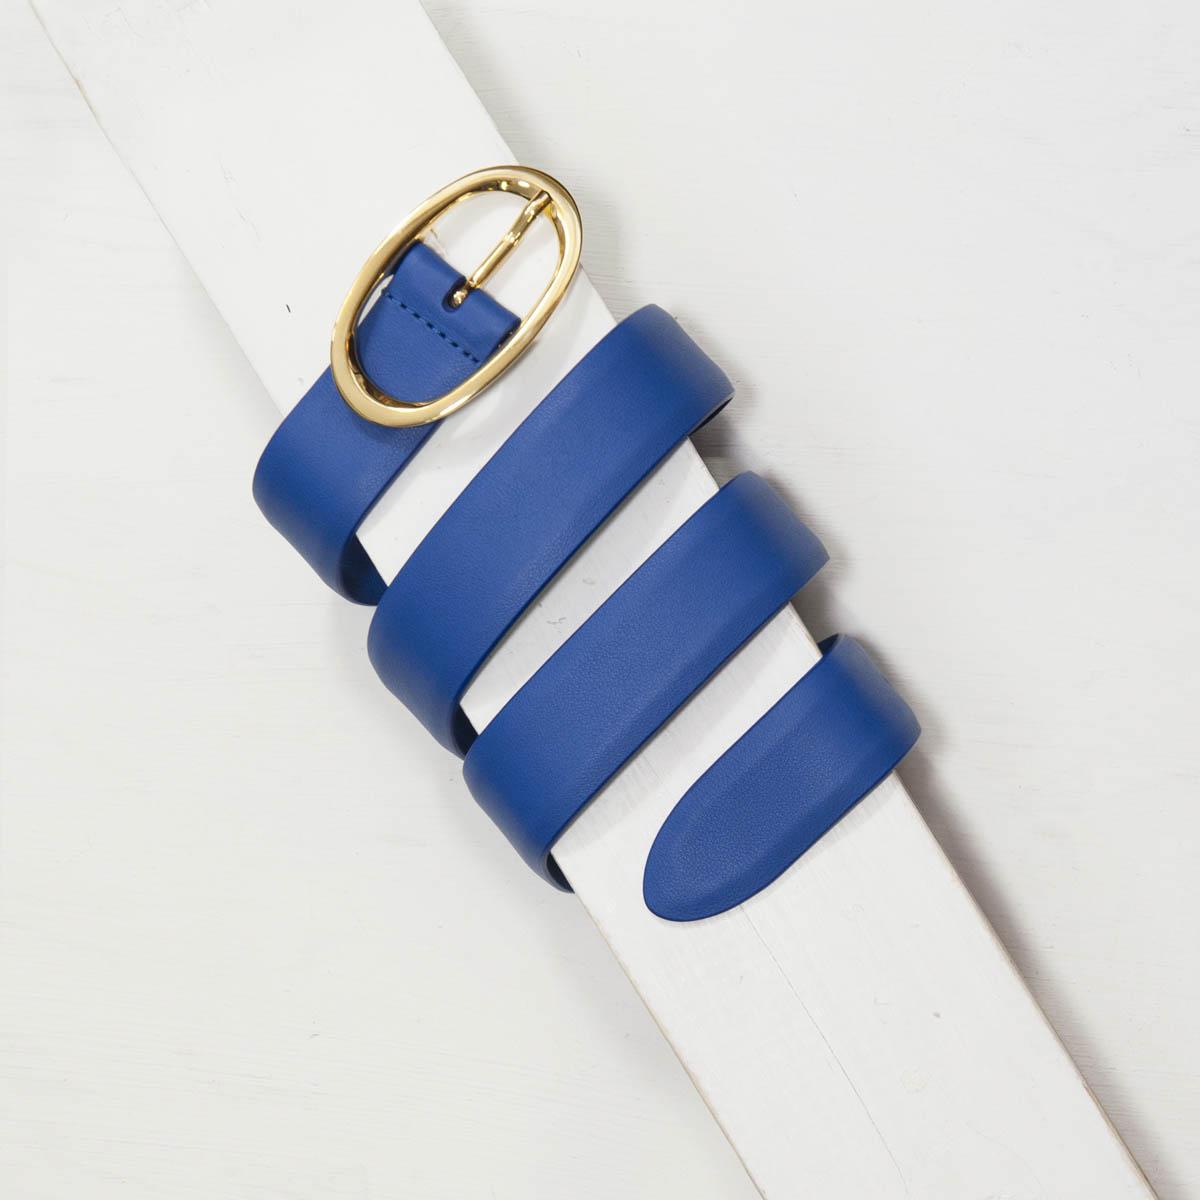 3,0 cm BLUE NAPPA LEATHER BELT